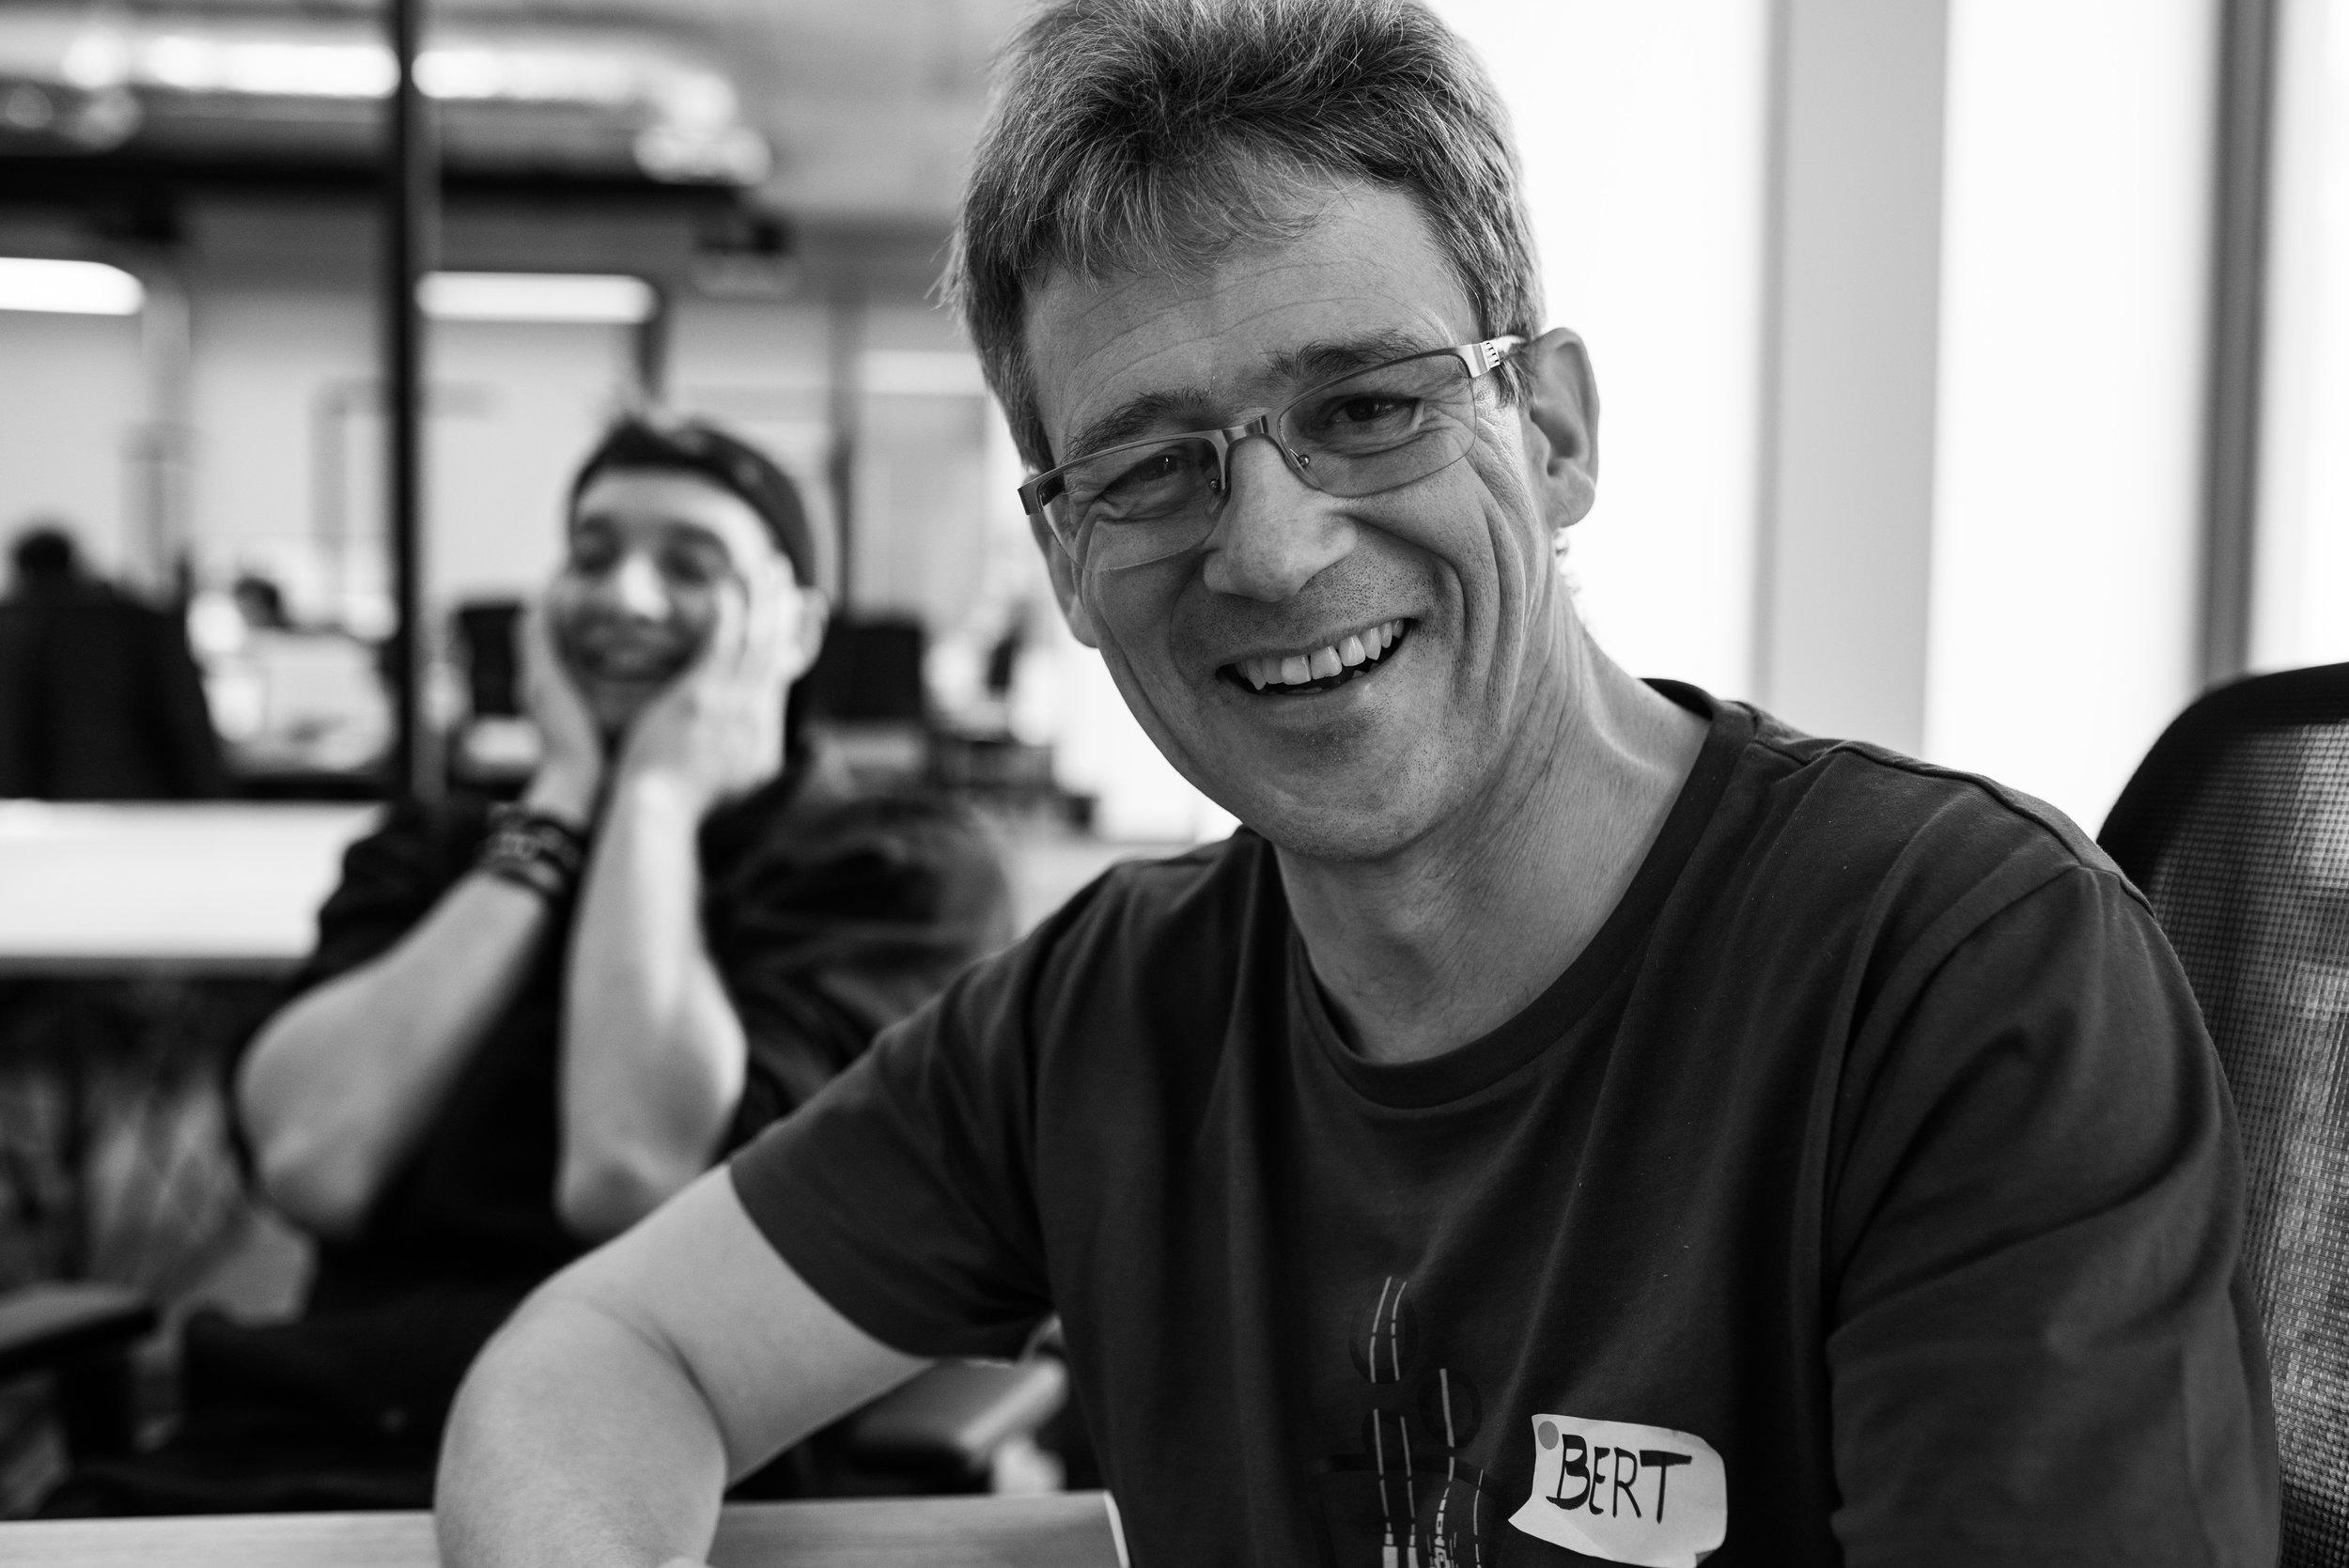 Photo of two team members taken during Startup Weekend in Prague by Tatiana Shalunova.jpg